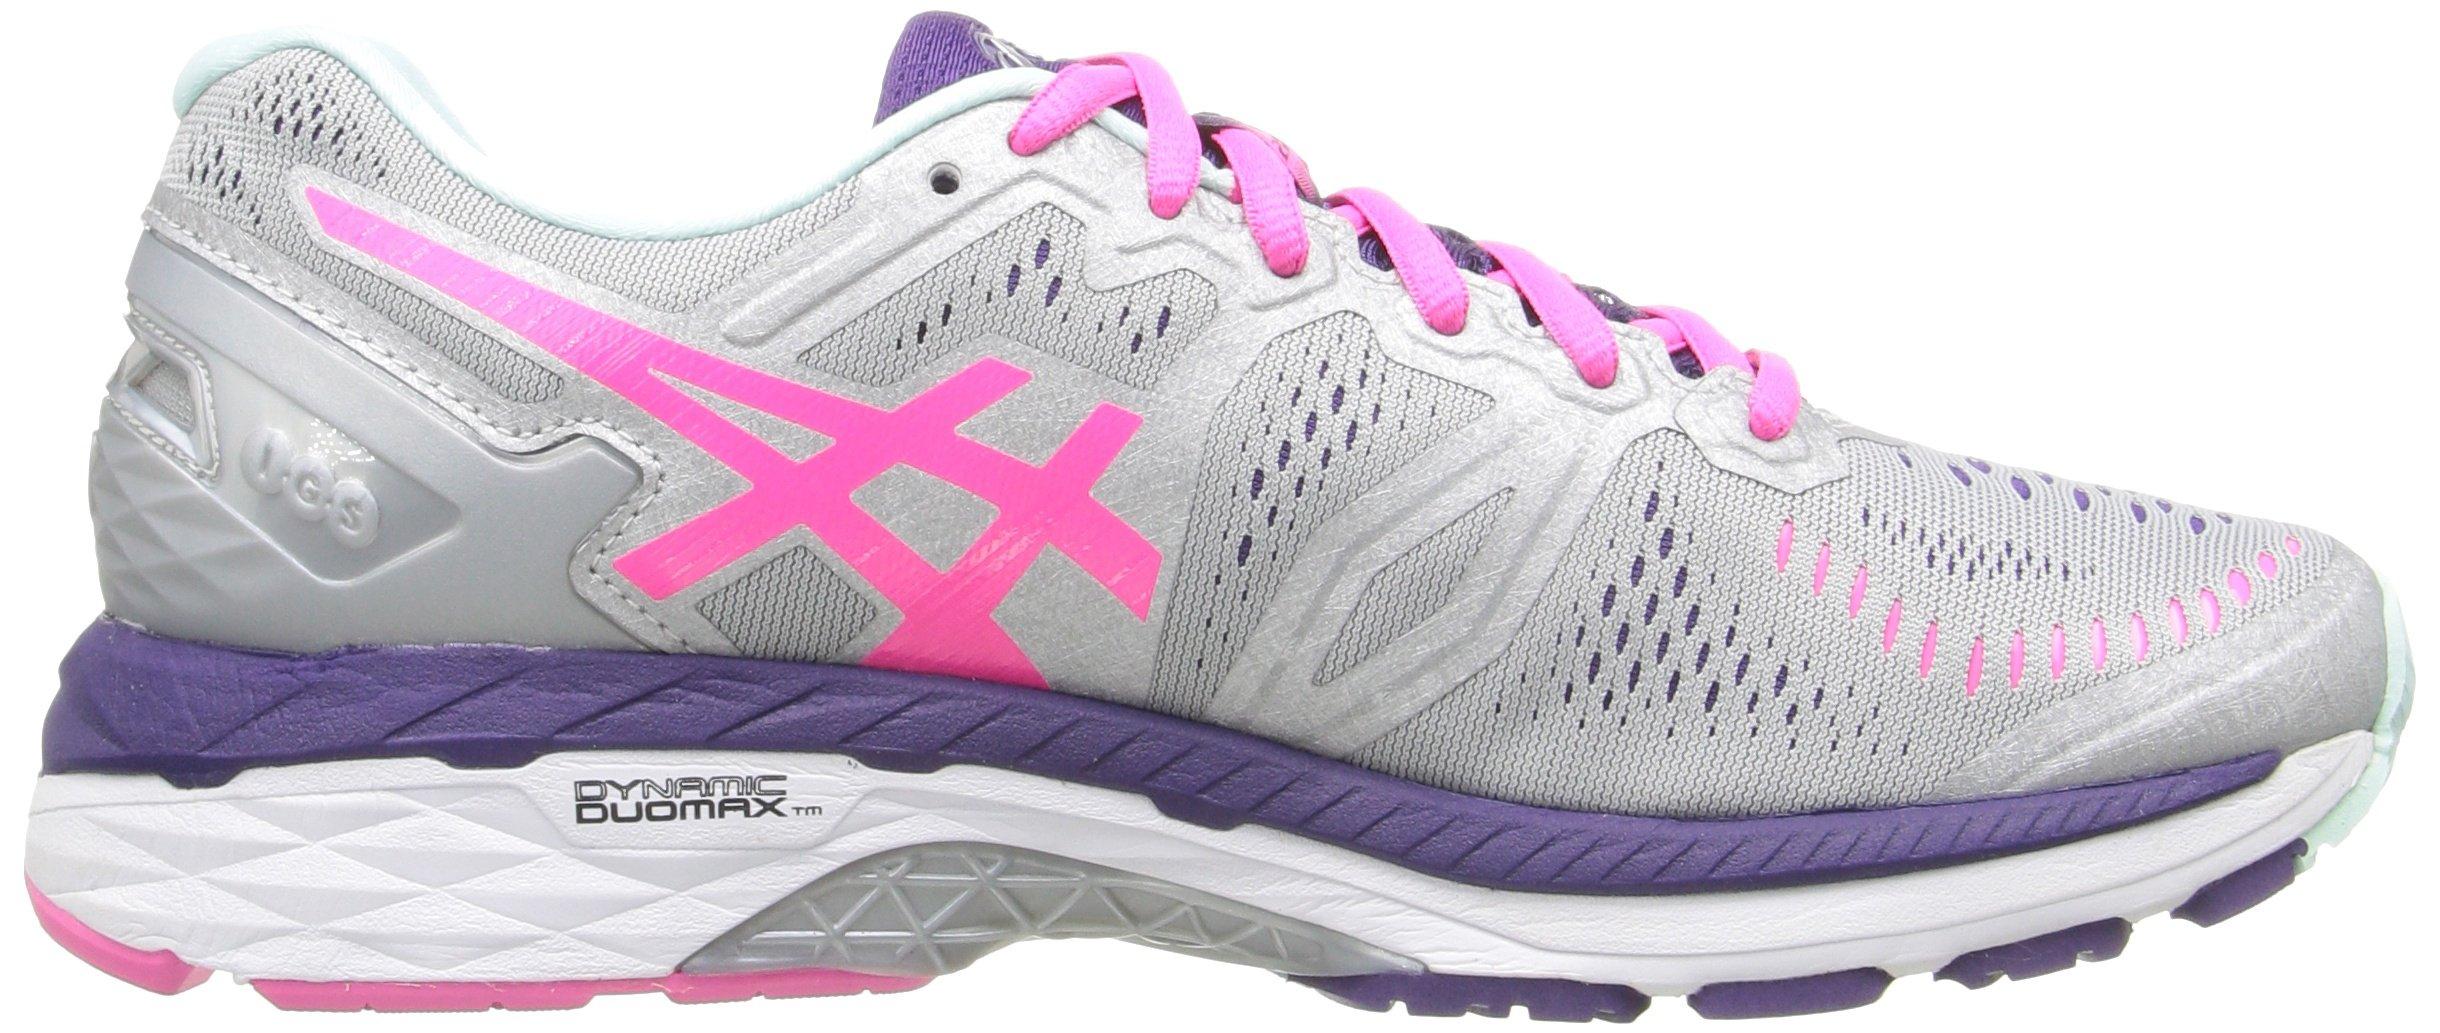 81wtjNGajCL - ASICS Women's Gel-Kayano 23 Running Shoe, Silver/Pink Glow/Parachute Purple, 5.5 UK